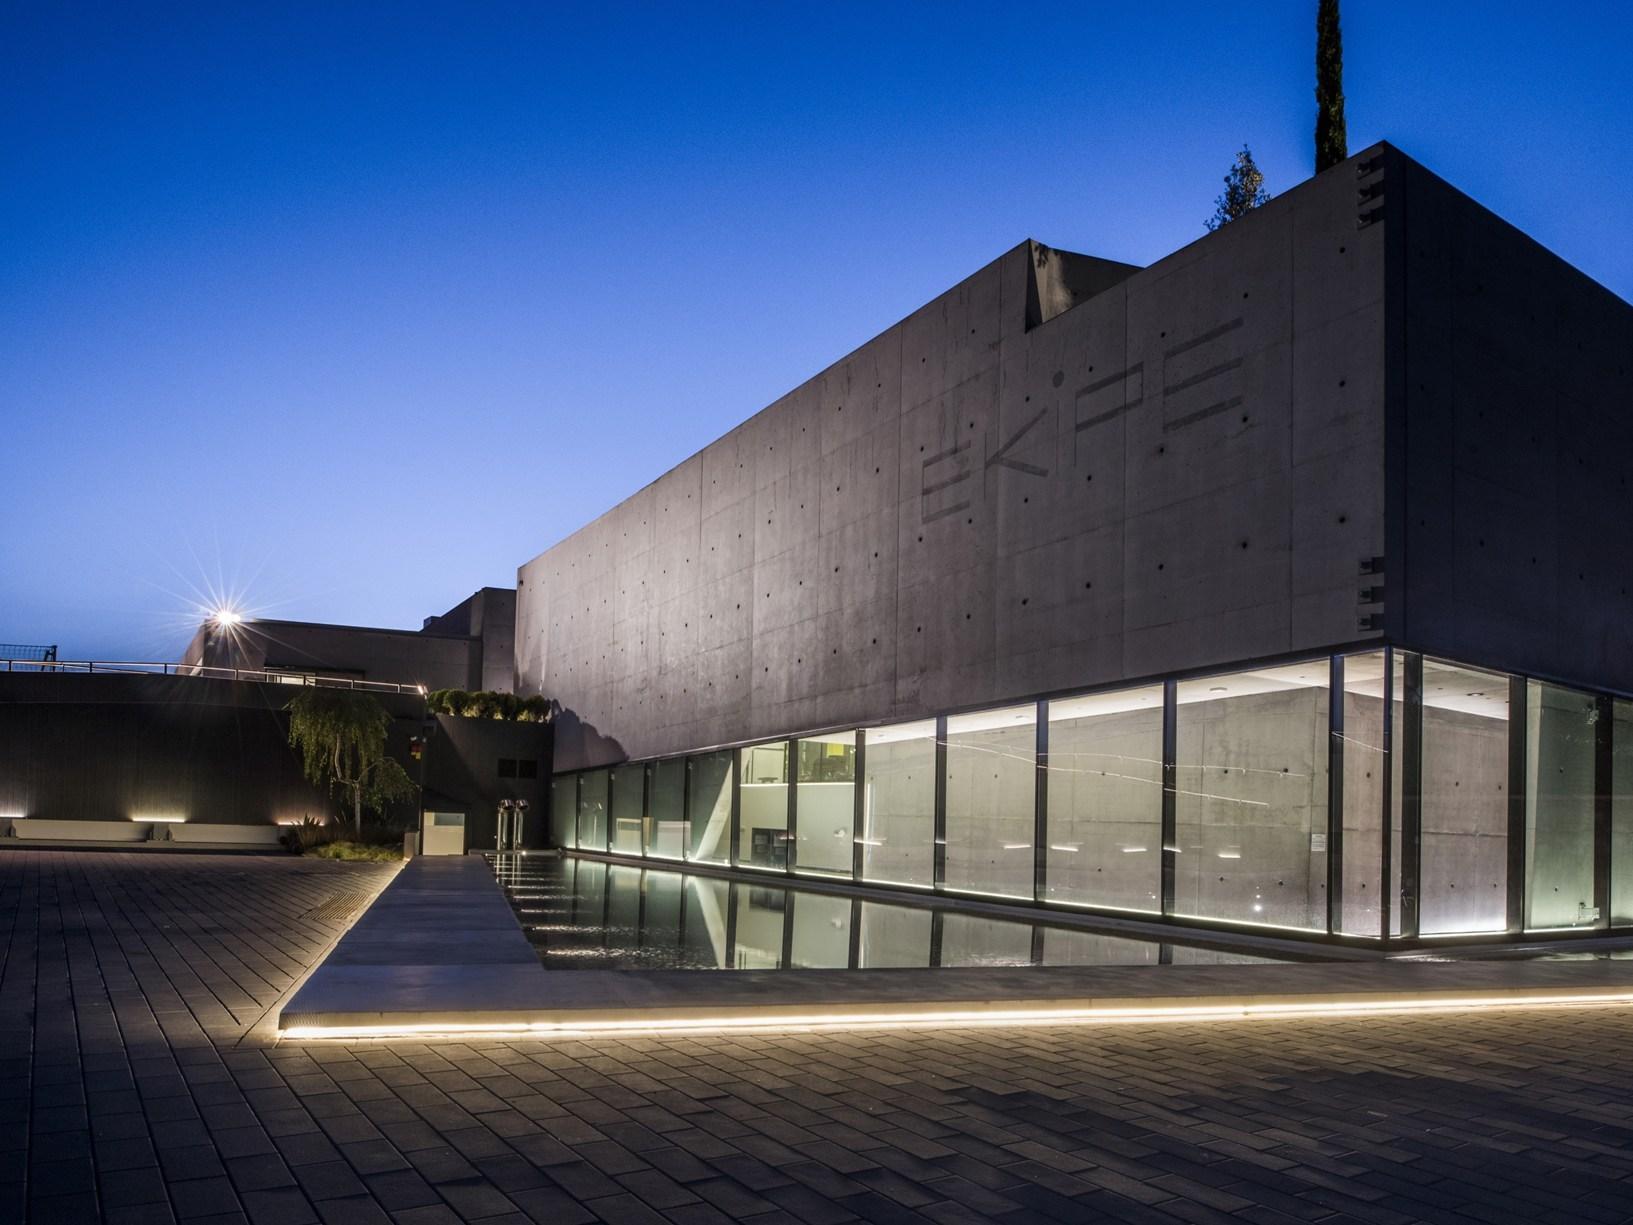 Interni Architettura Of Architettura Brutalista Interni Glamour